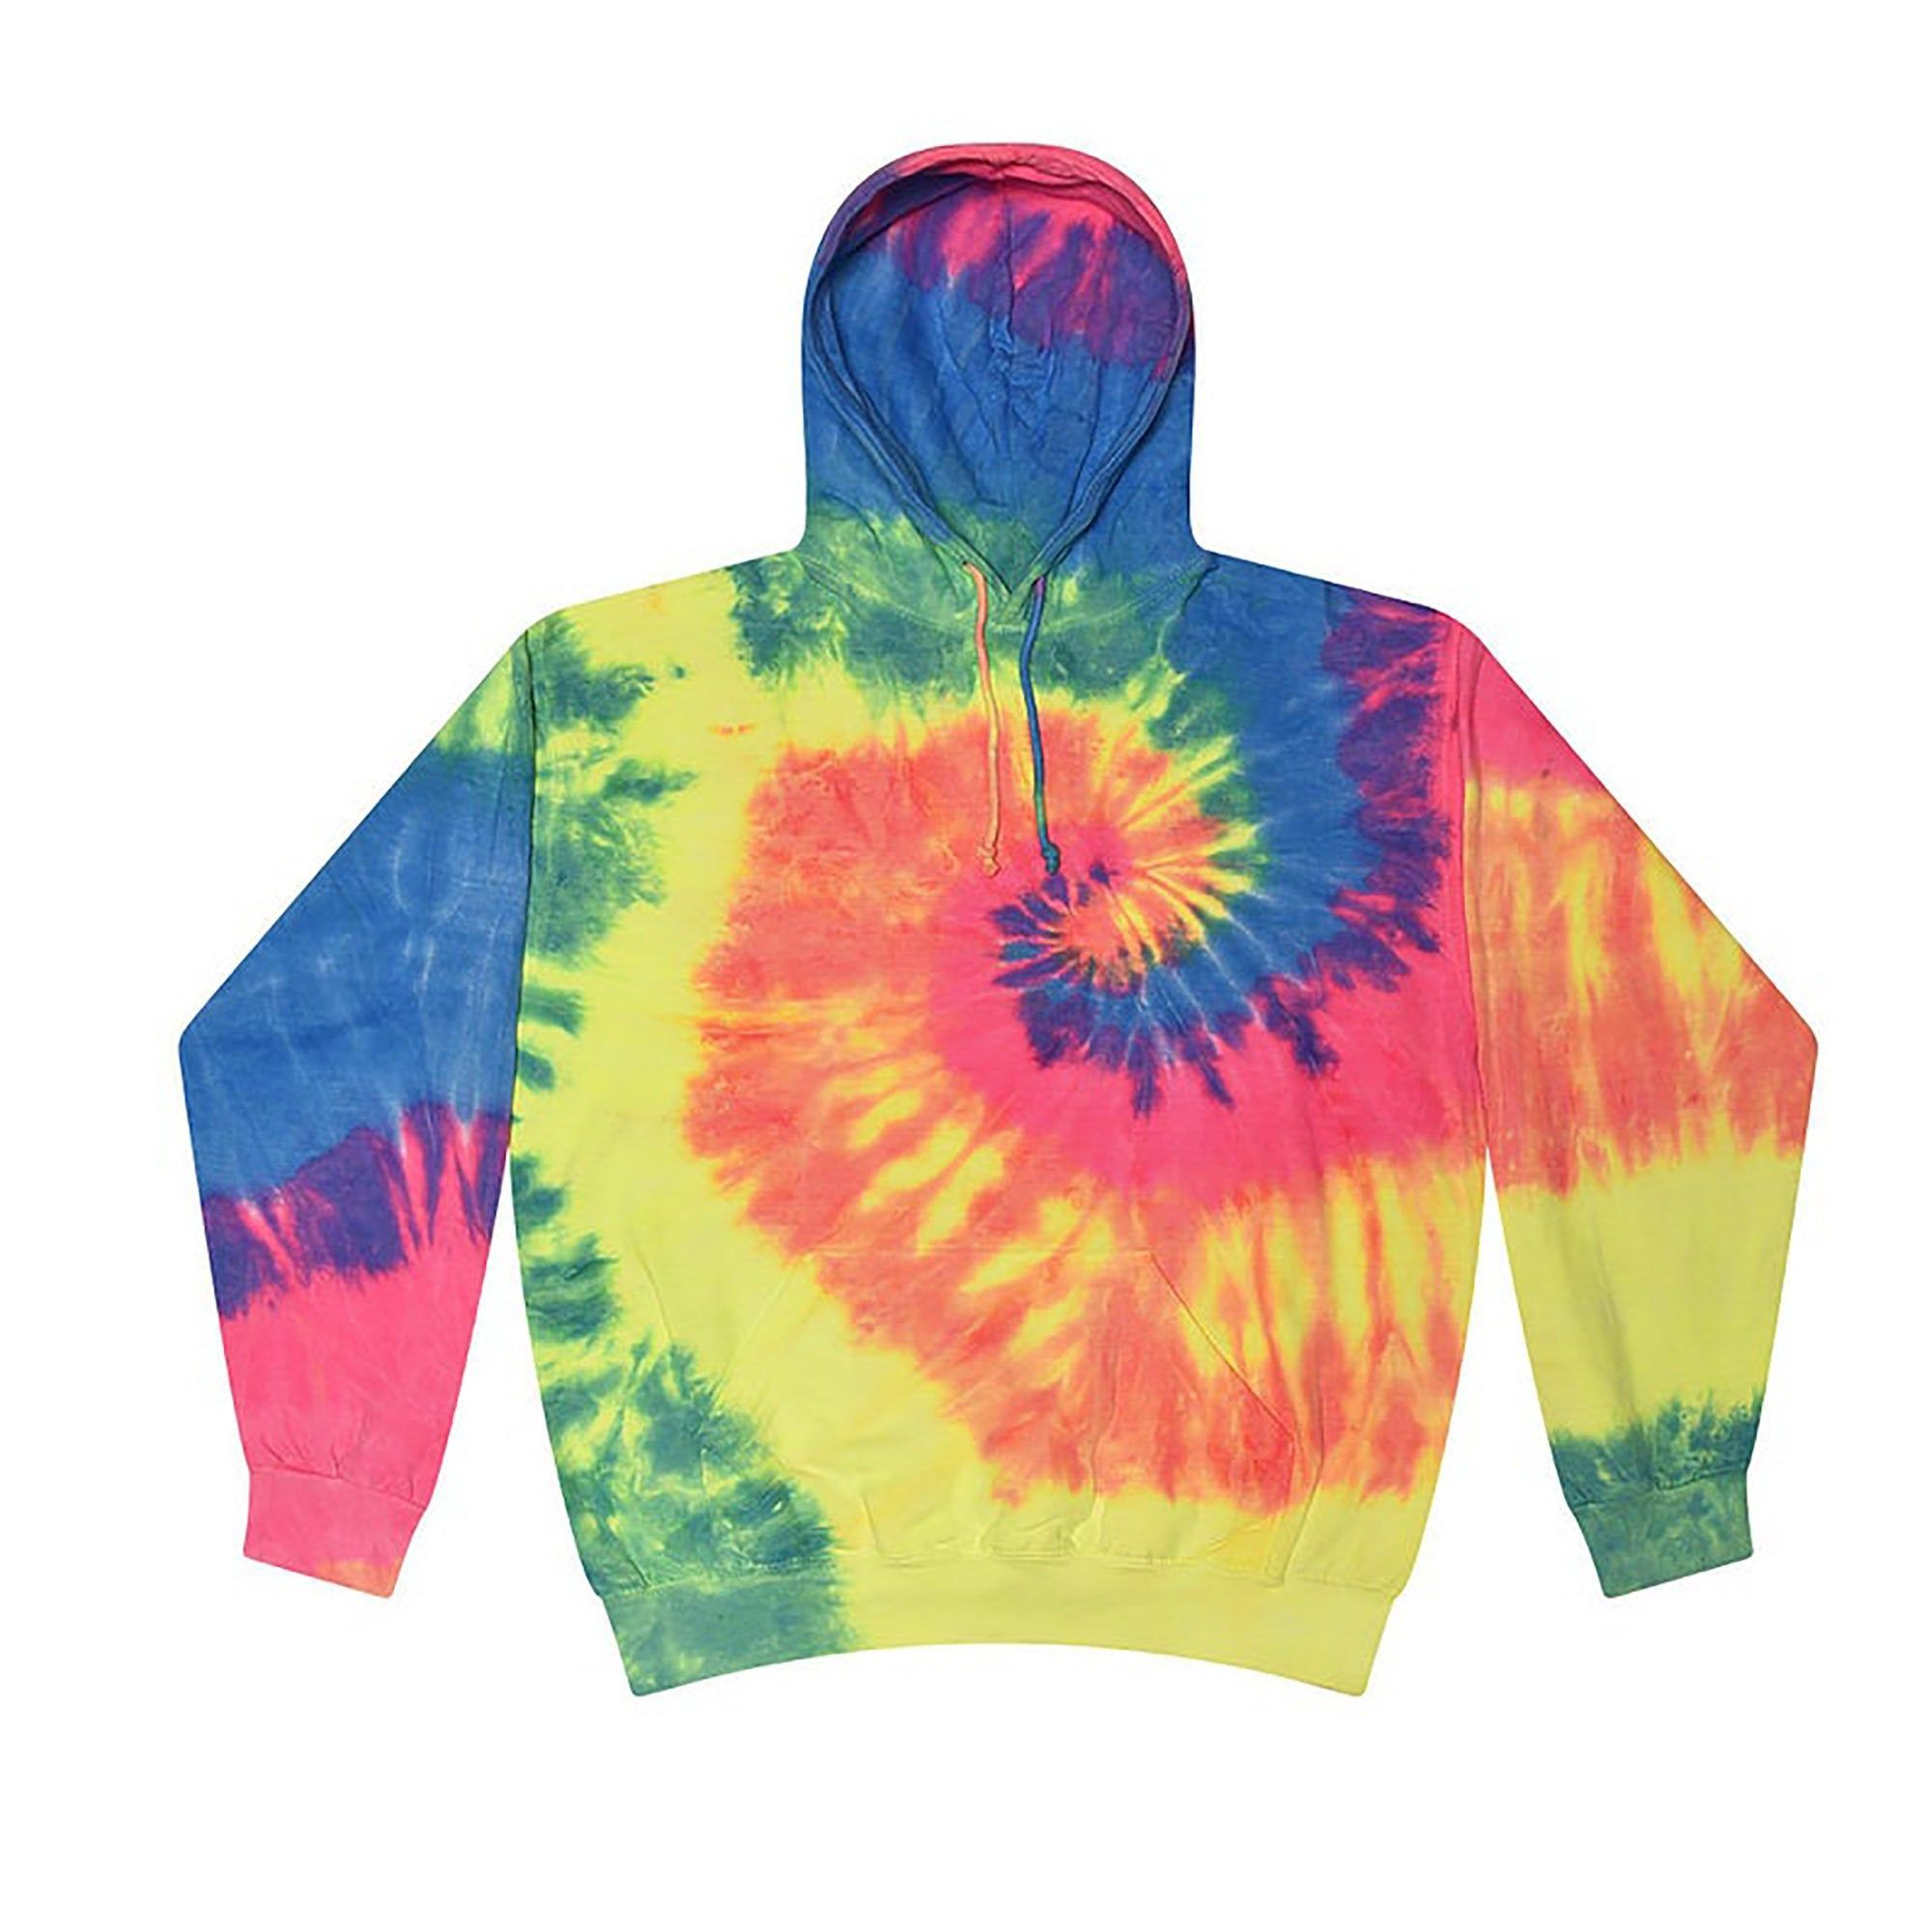 Customize Your Tie Dye Hoodie Unisex Tie Dye Hoodie Tie Dye Hoodie Tie Dye Tie Dye Outfits [ 2000 x 2000 Pixel ]